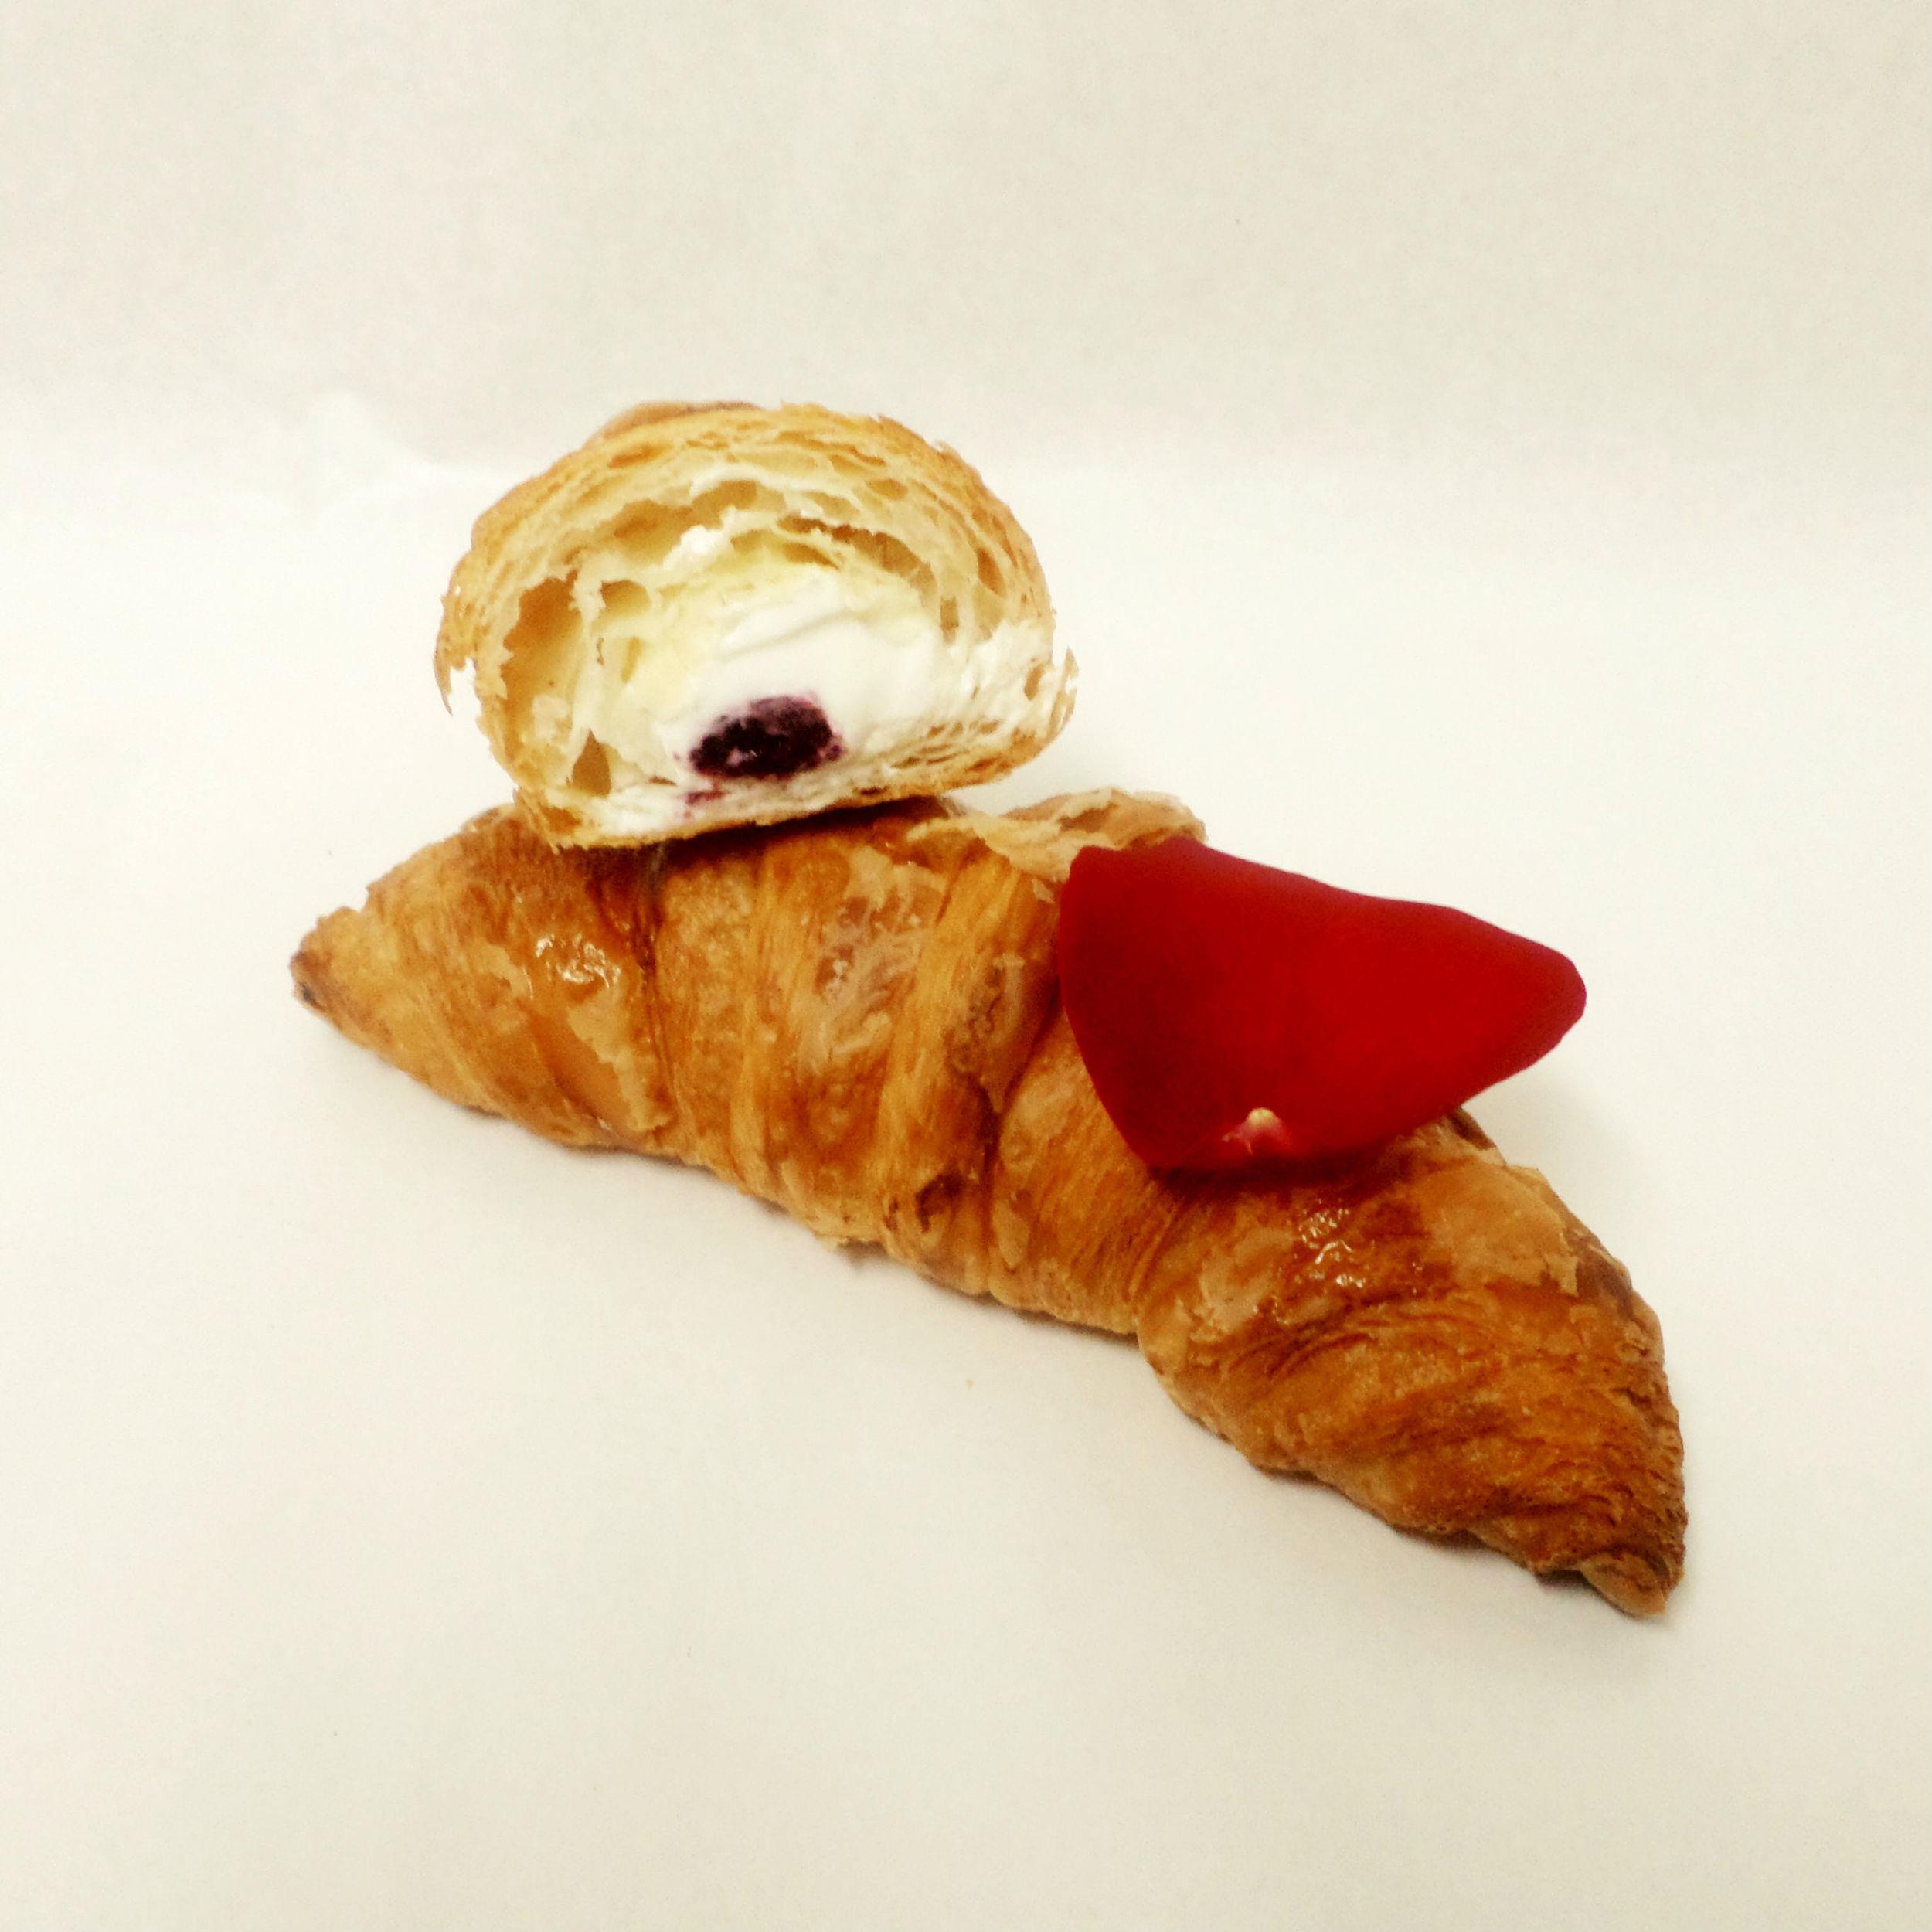 Croissant relleno de compota de frambuesas, queso mascarpone y rosa